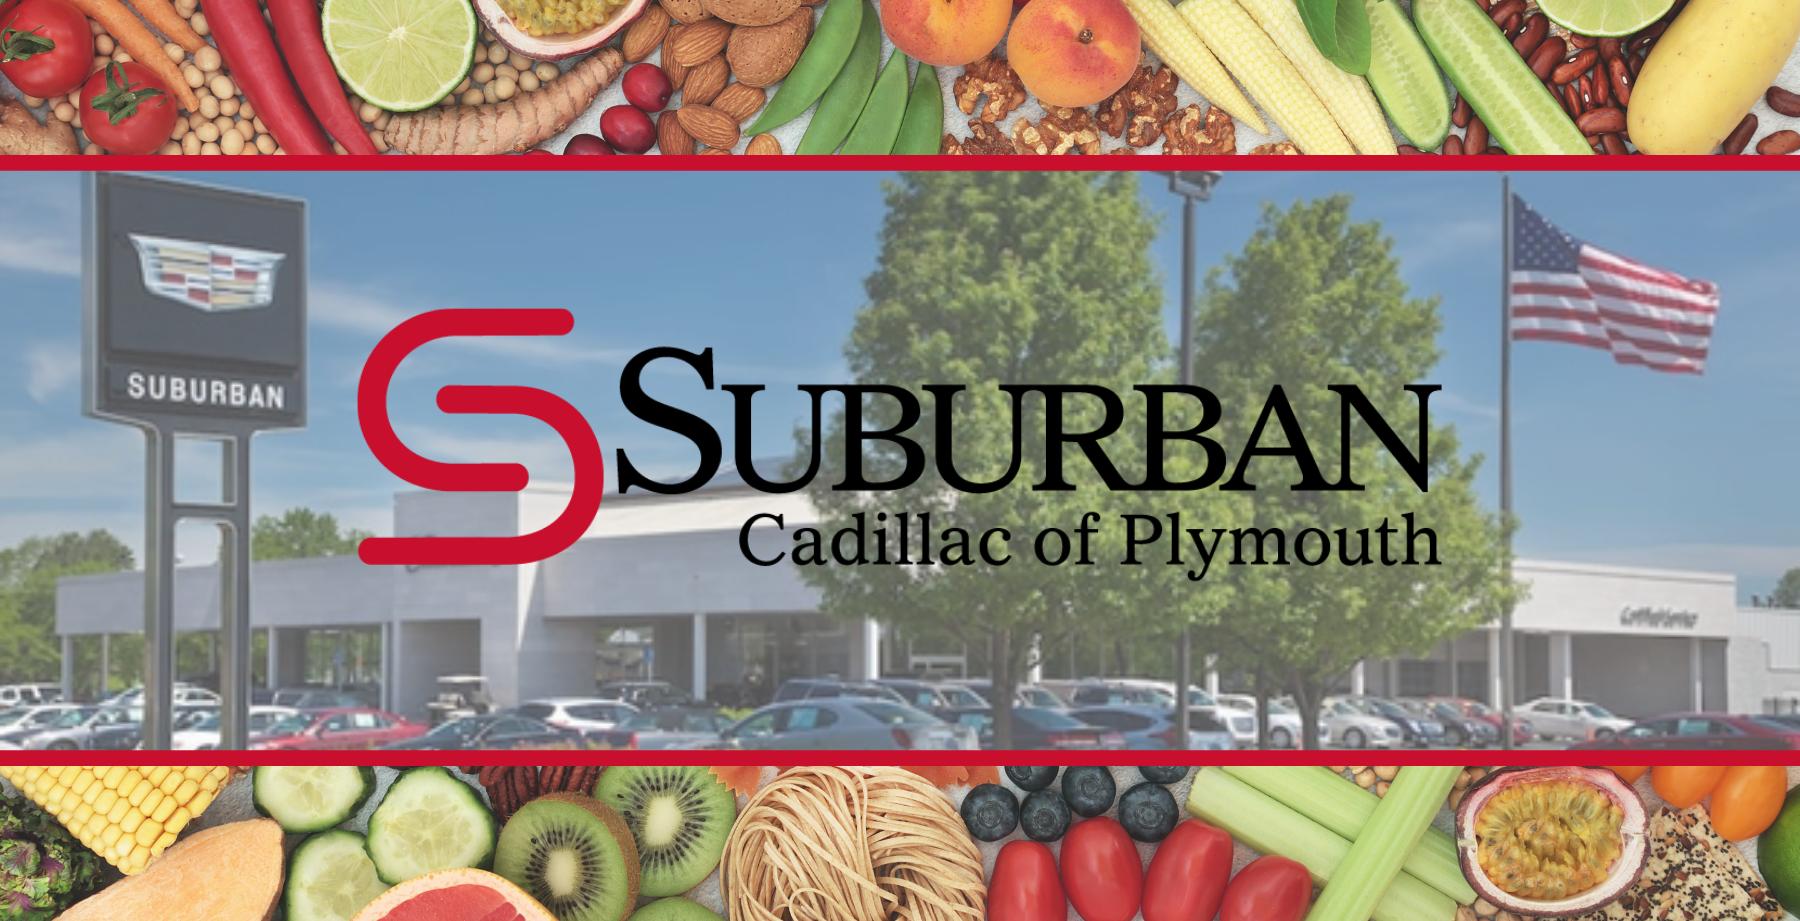 Suburban Cadillac of Plymouth